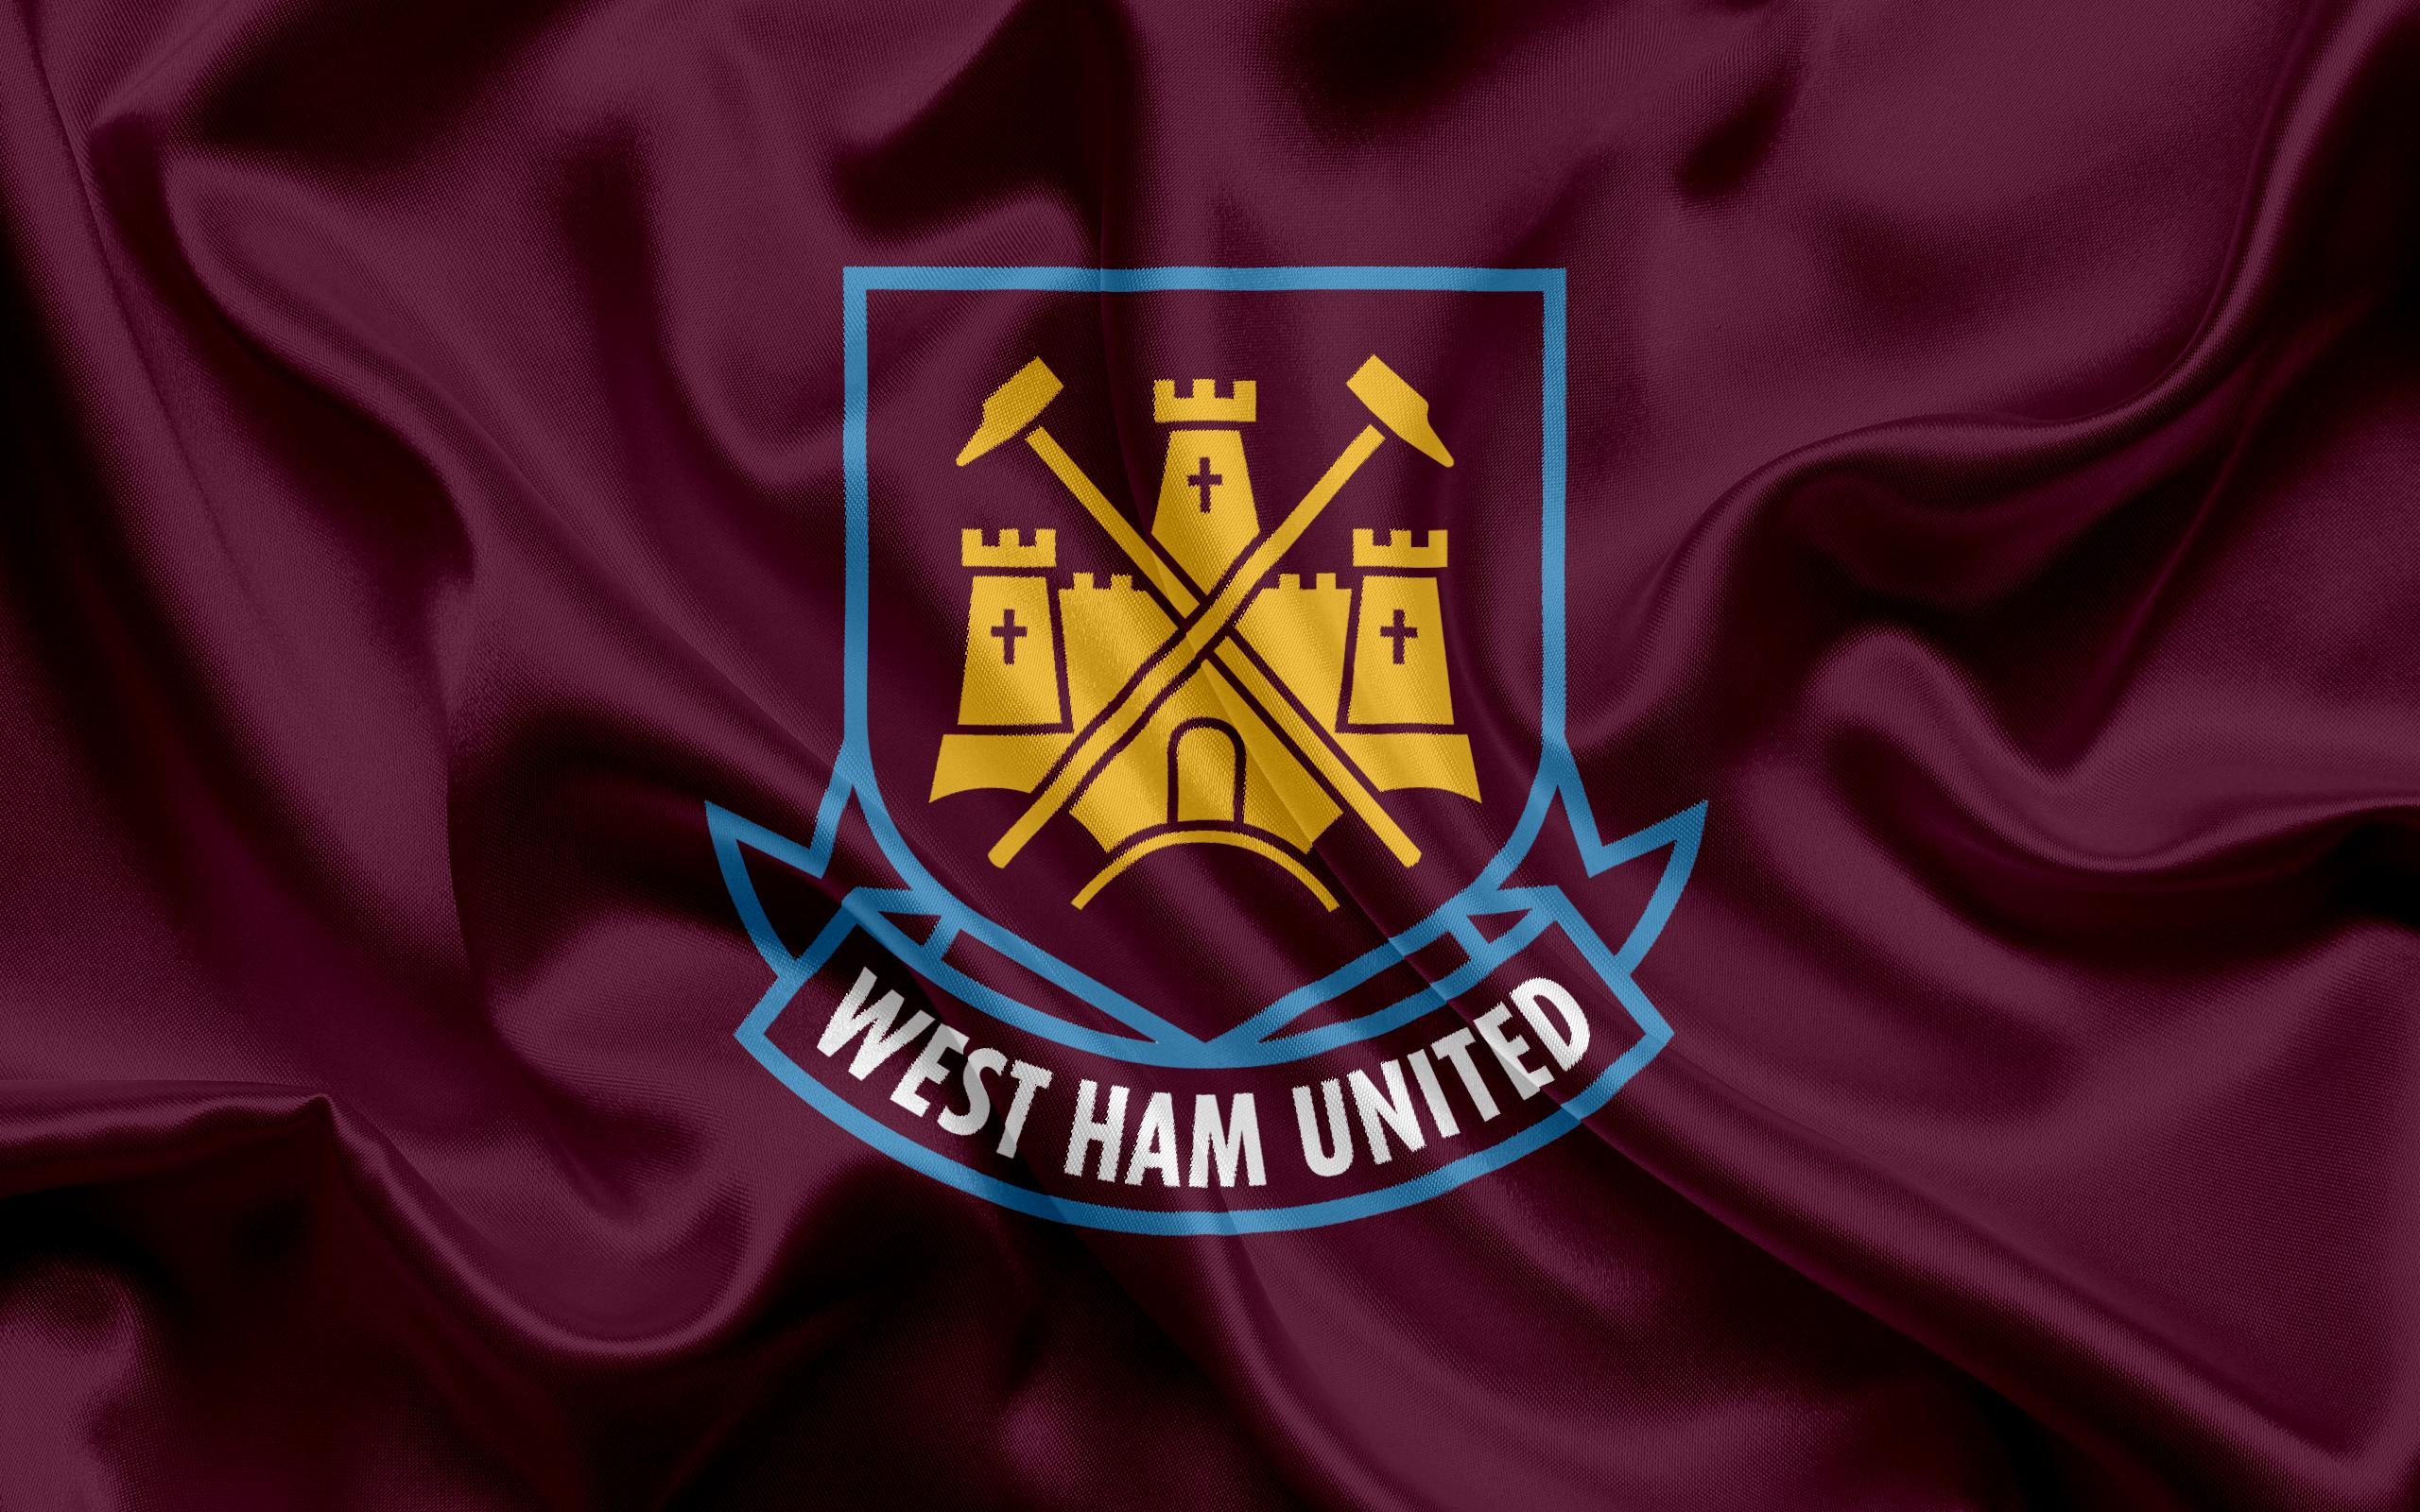 West Ham United FC HD Wallpaper Background Image 2560x1600 2560x1600